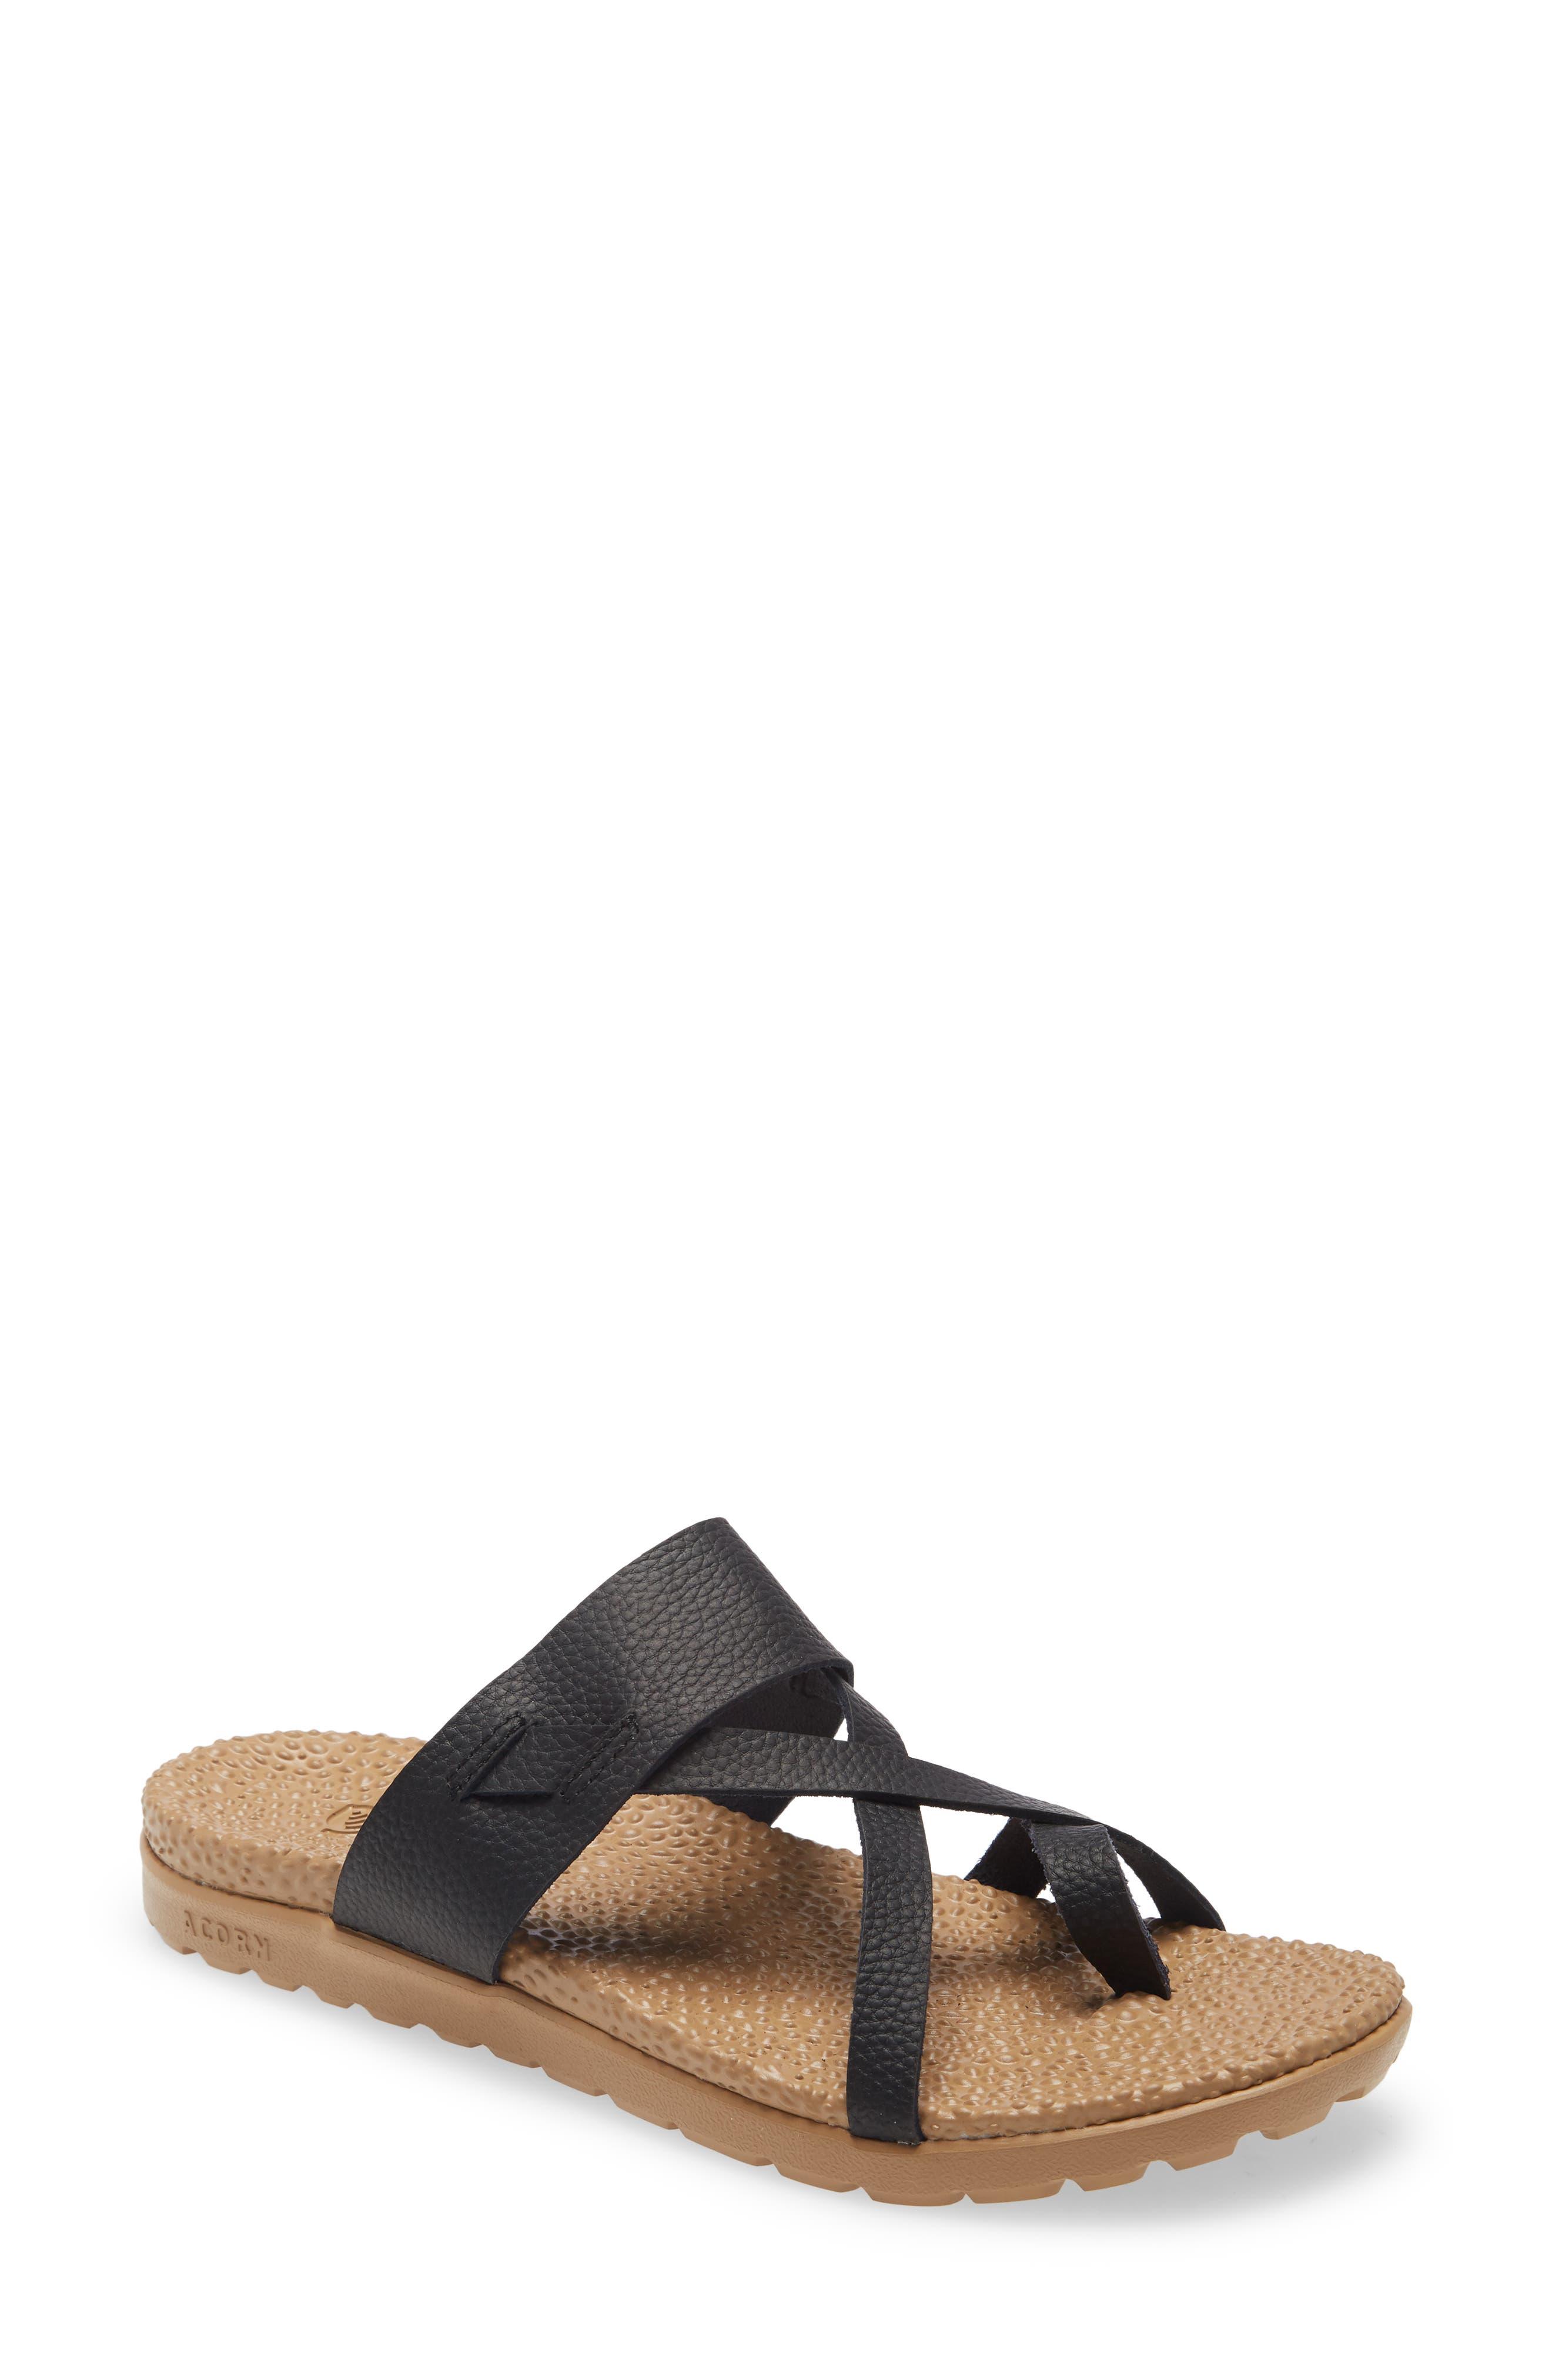 Riley Leather Sandal